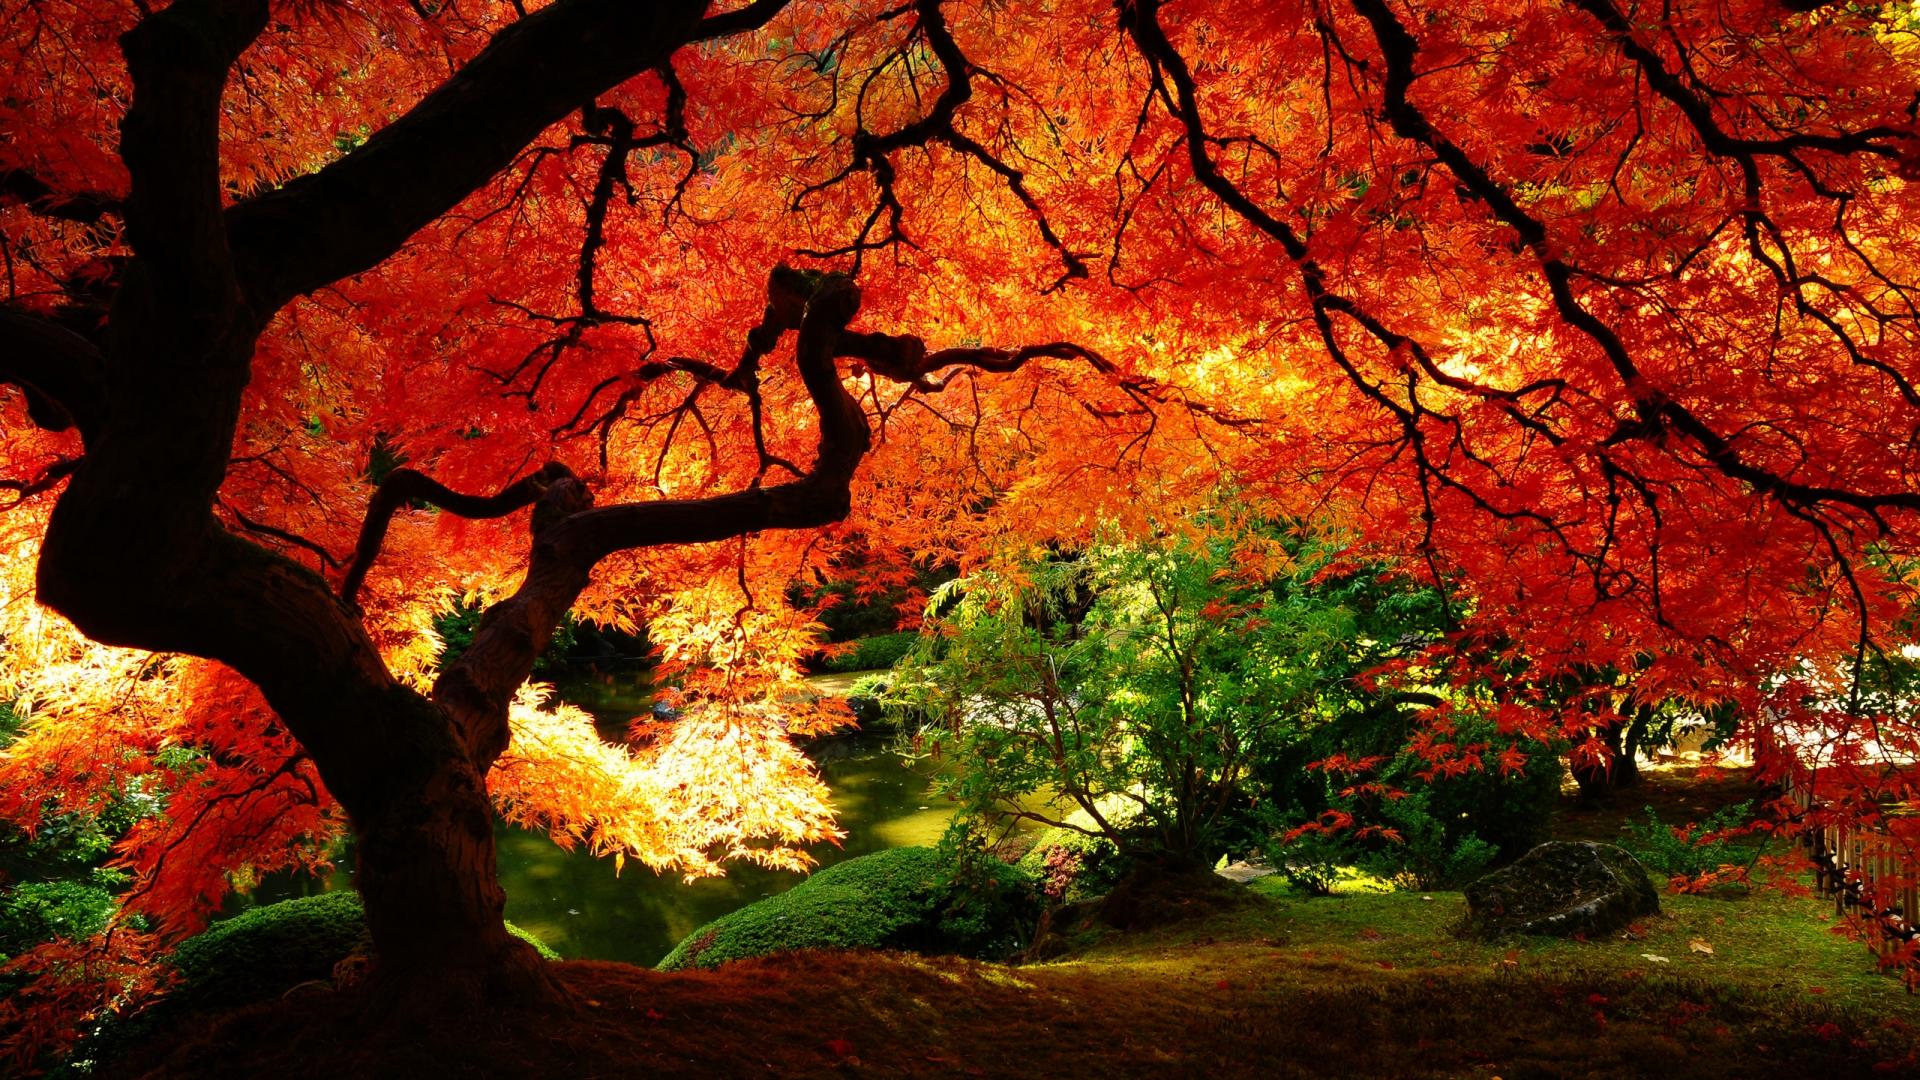 Autumn Fall Wallpaper 1920x1080